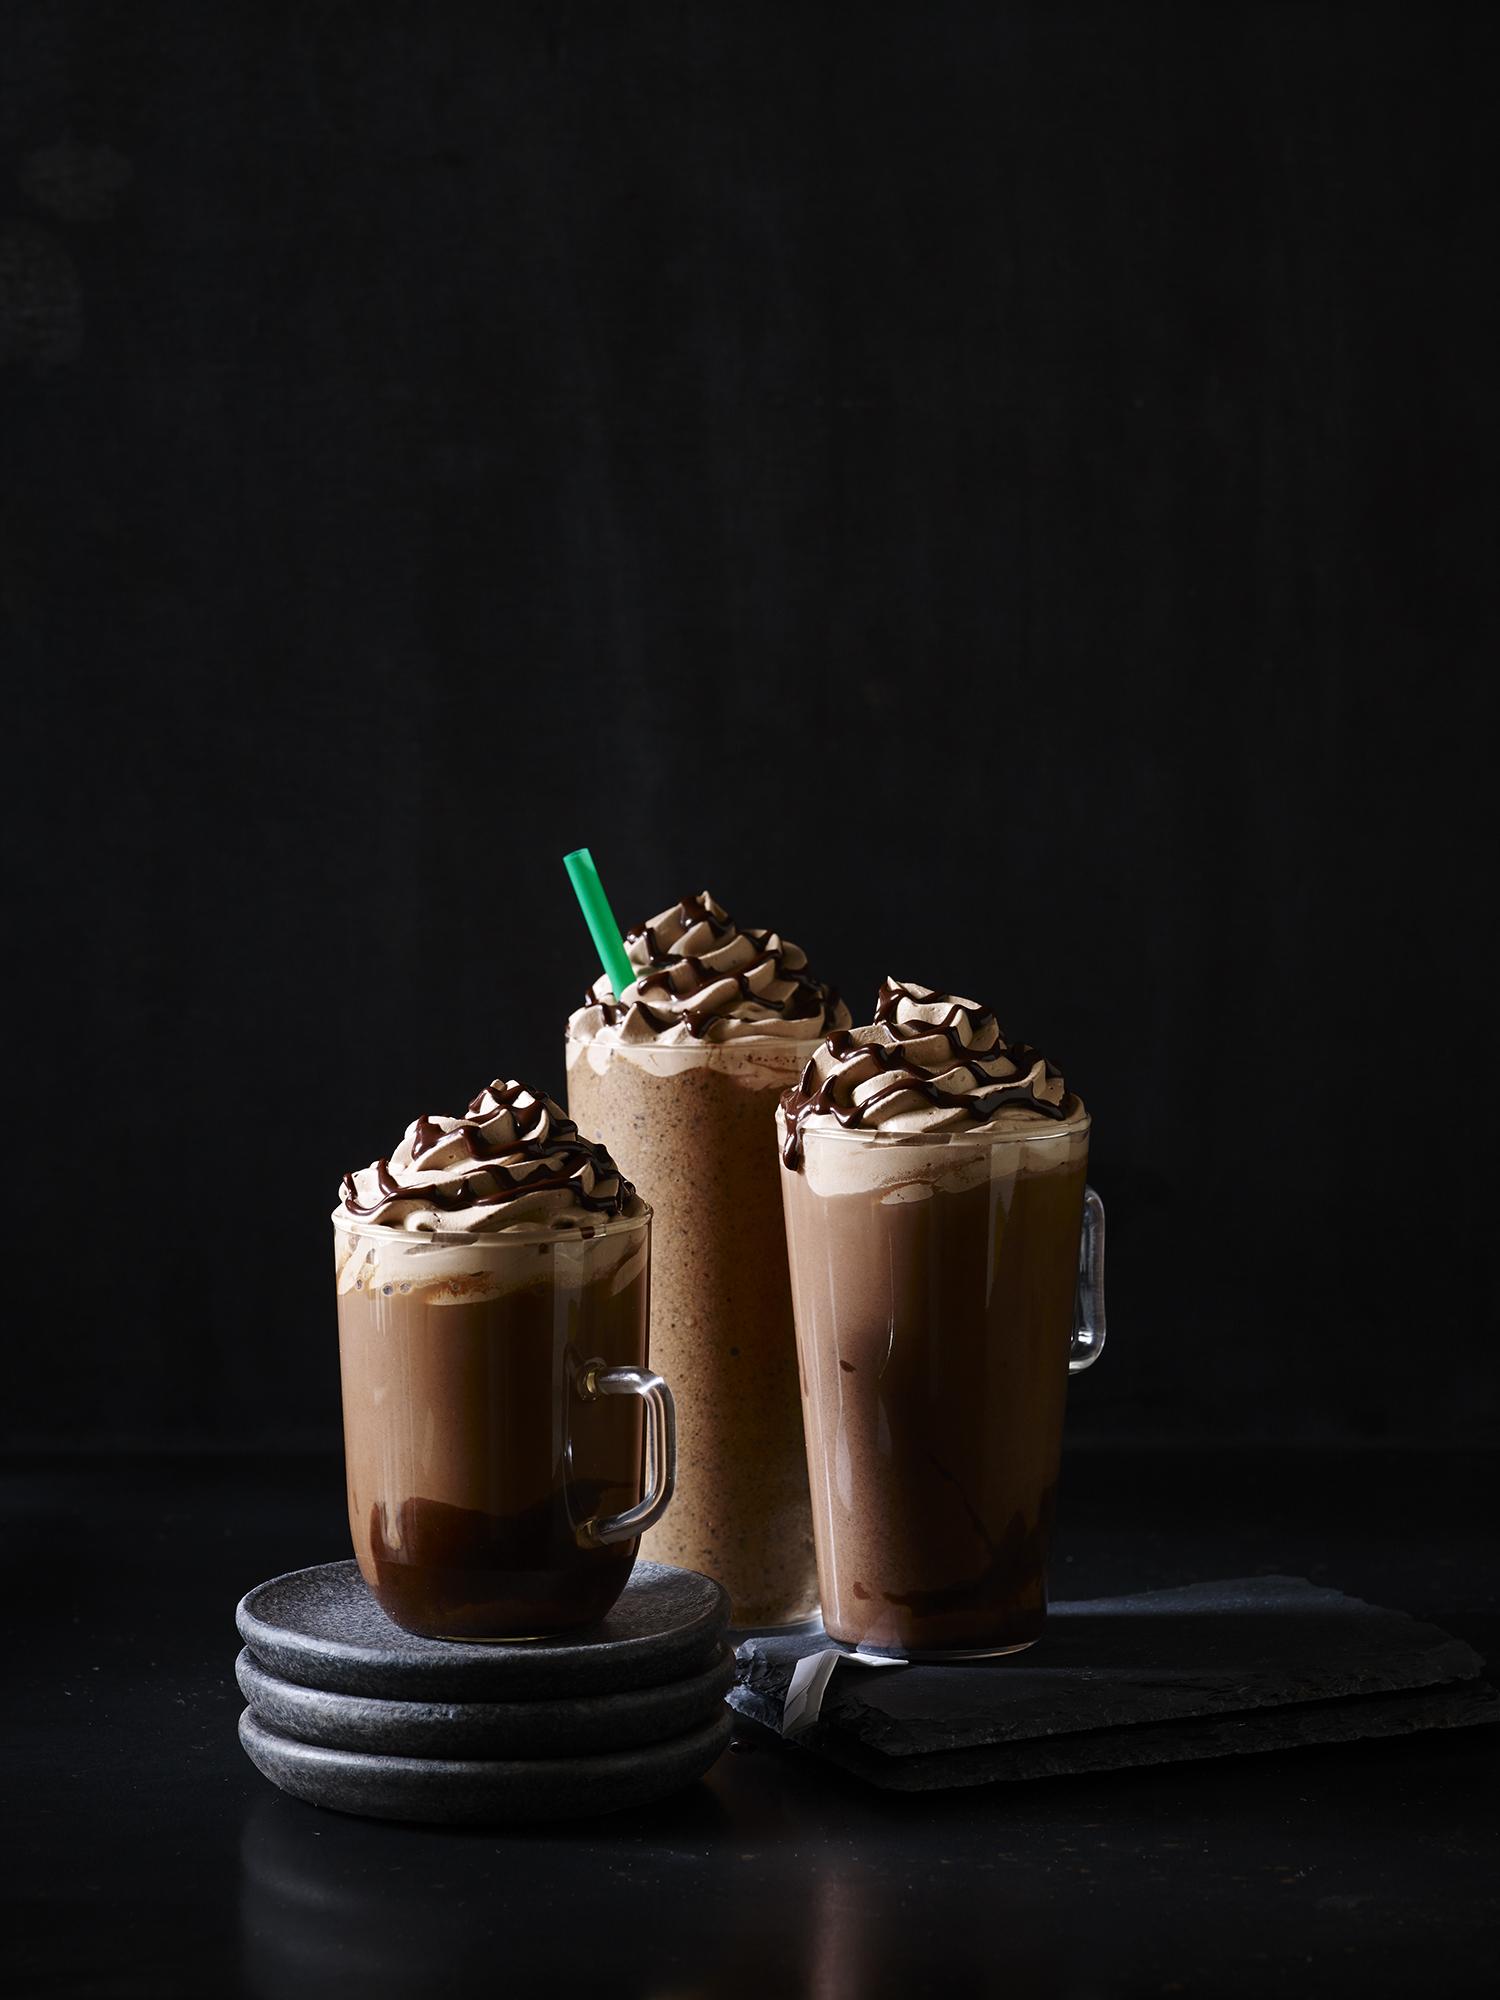 Three chocolate coffee drinks from Starbucks.